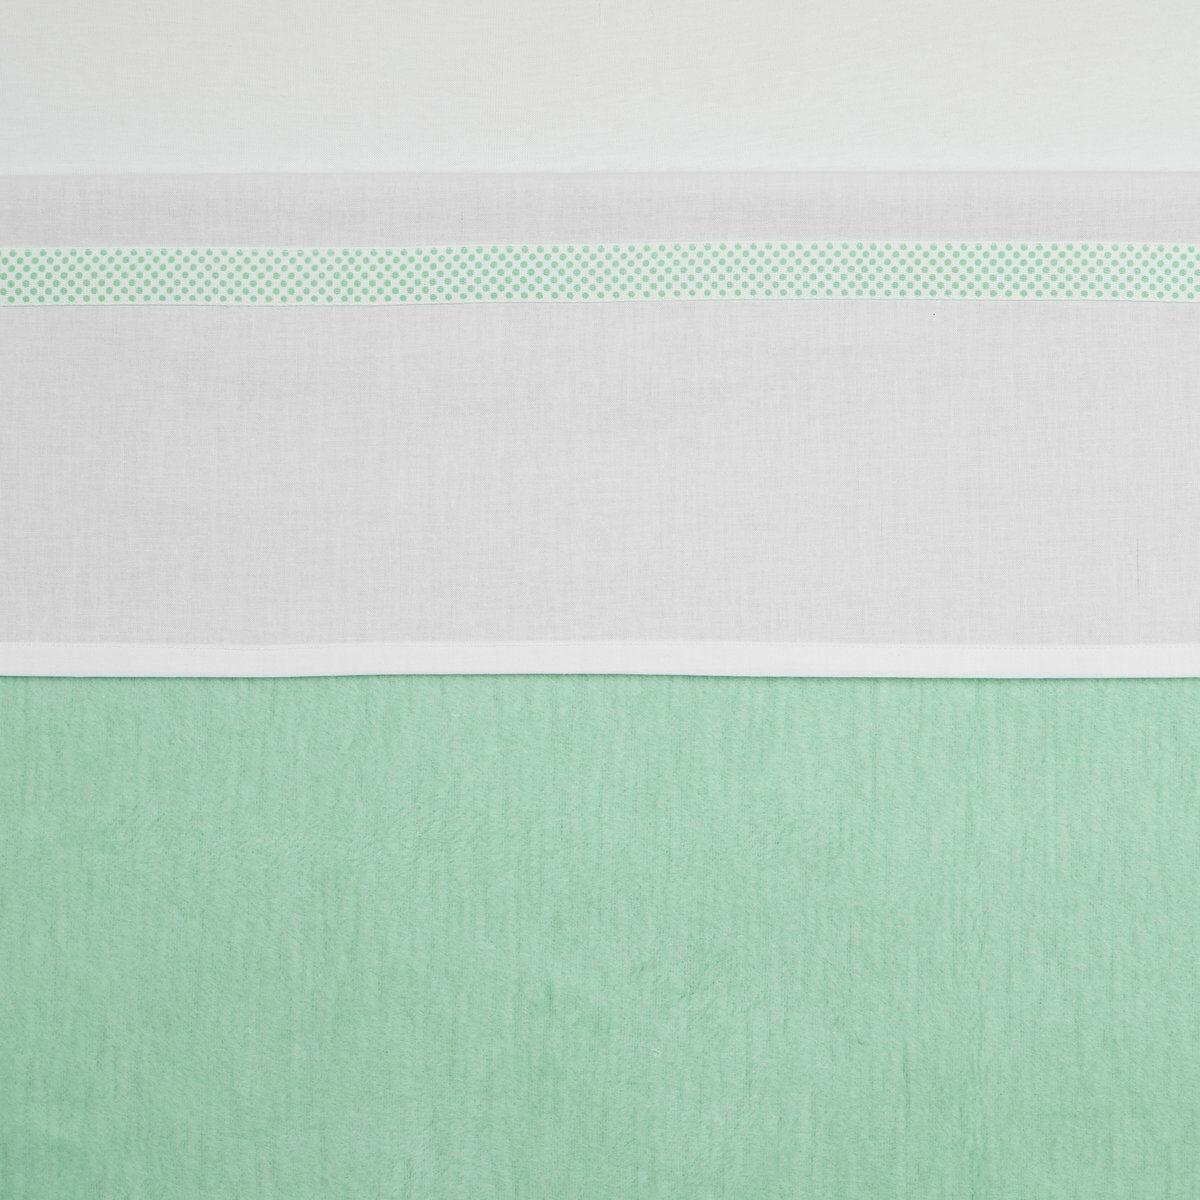 Meyco Ledikantlaken Bies Stip New Mint 100 x 150 cm